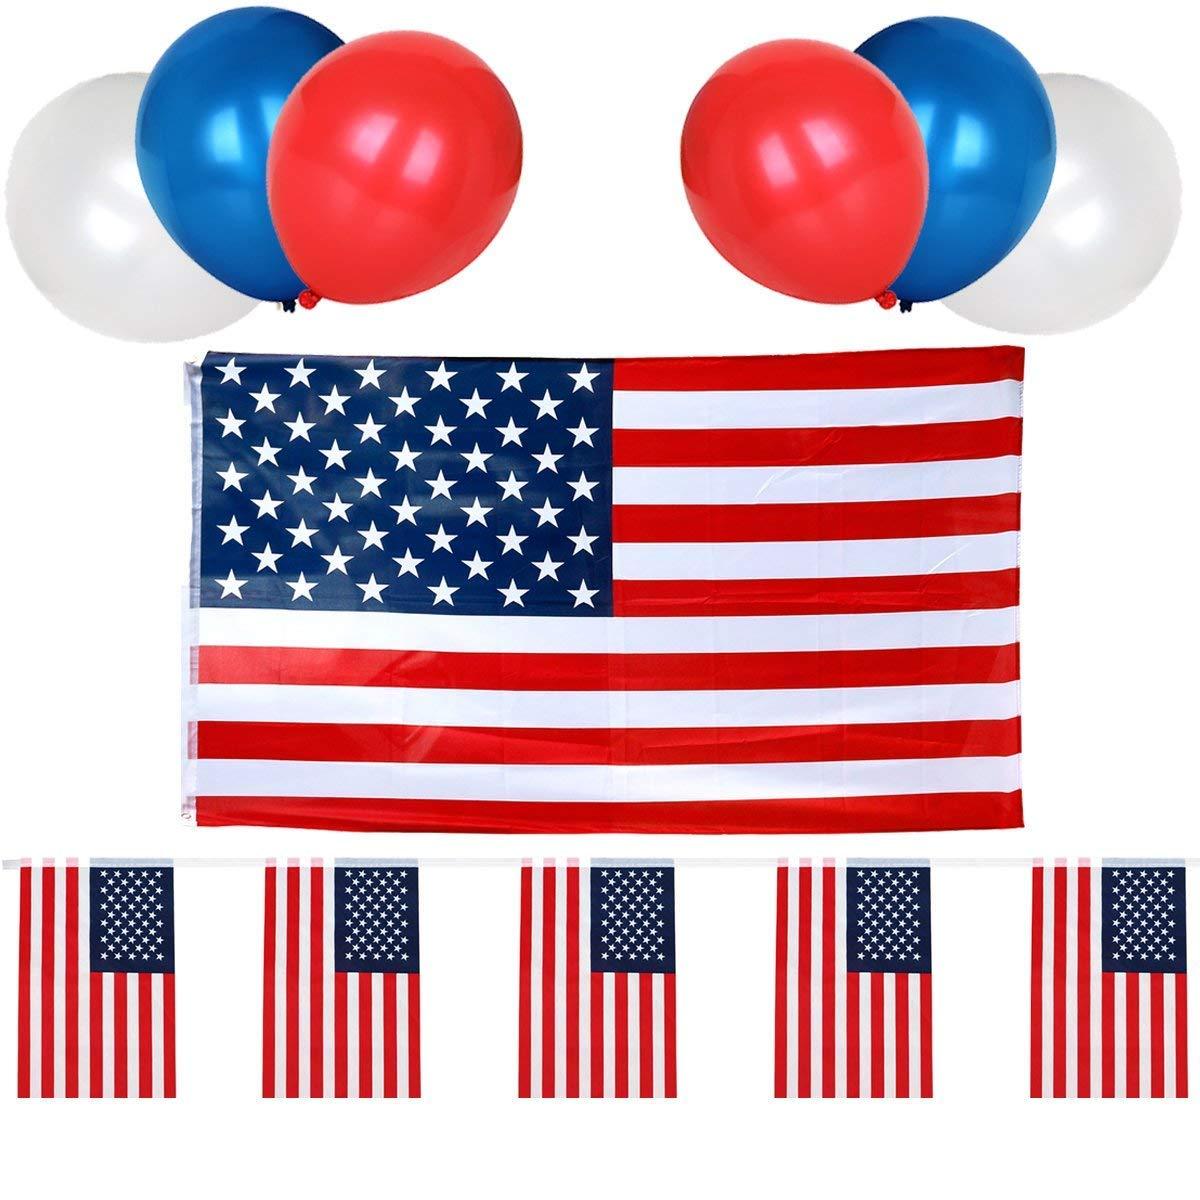 USA   5ftx3ft Flag UNITED STATES AMERICA